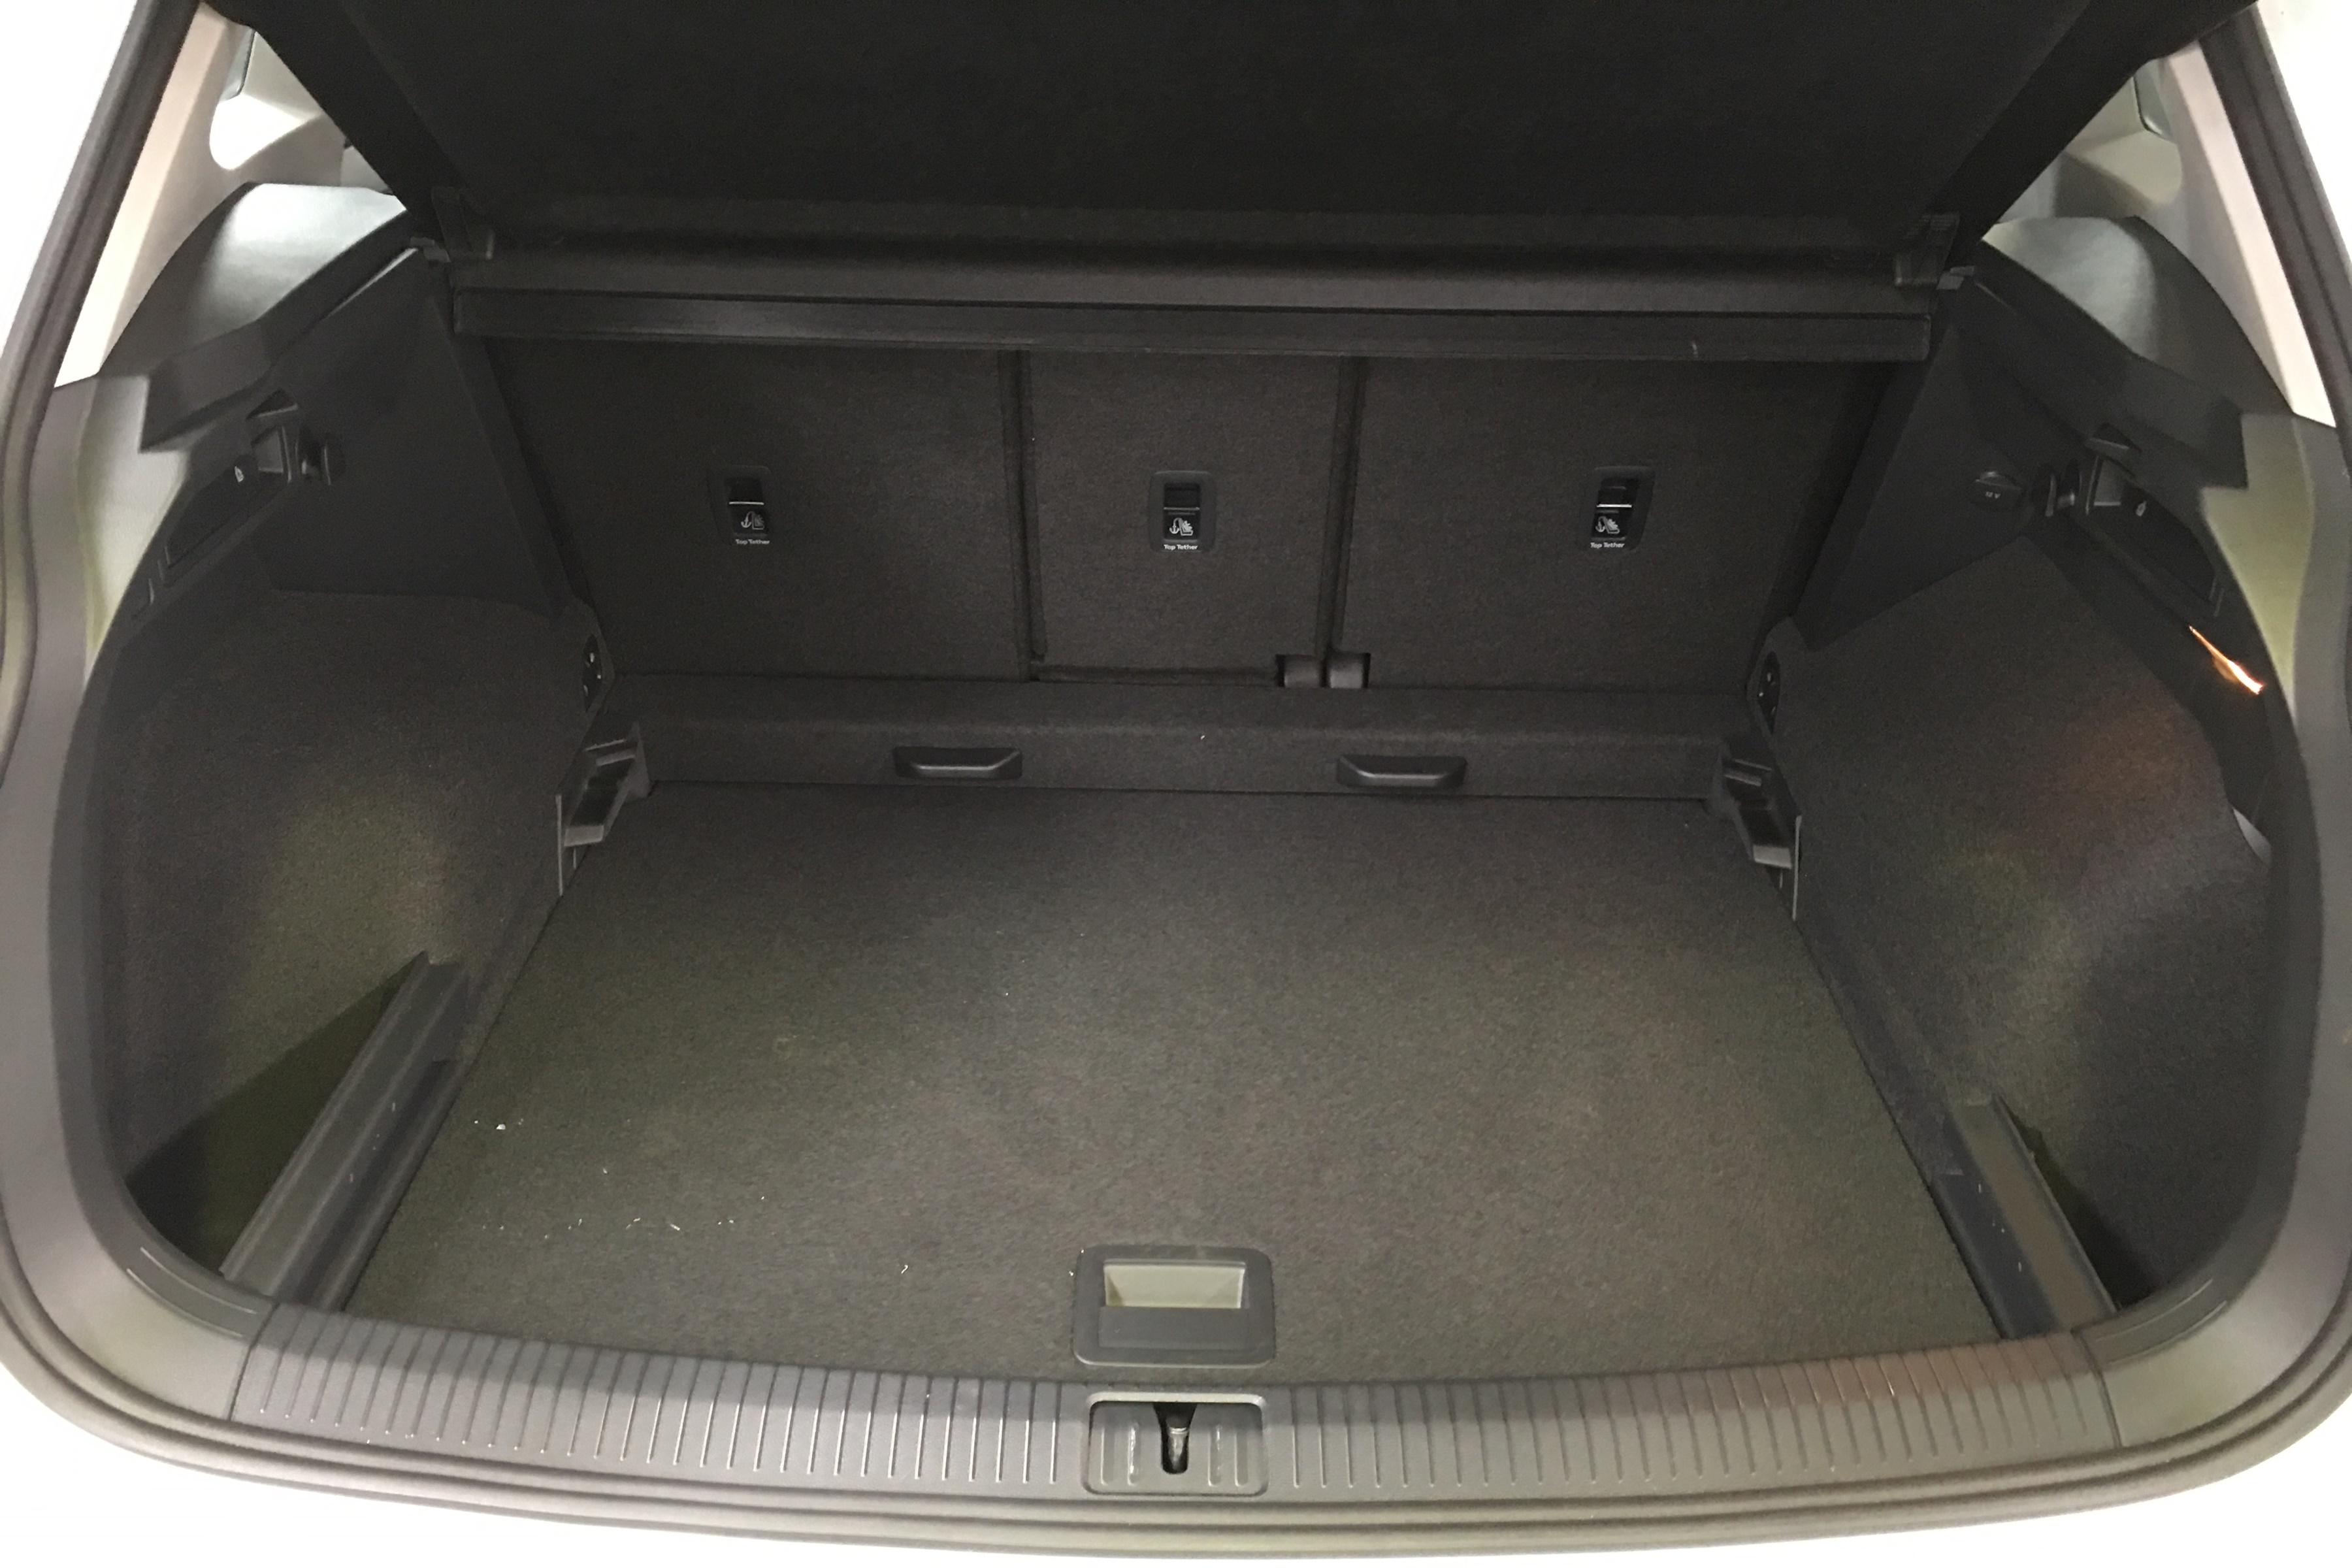 VW Tiguan 132 TSi Comfortline boot